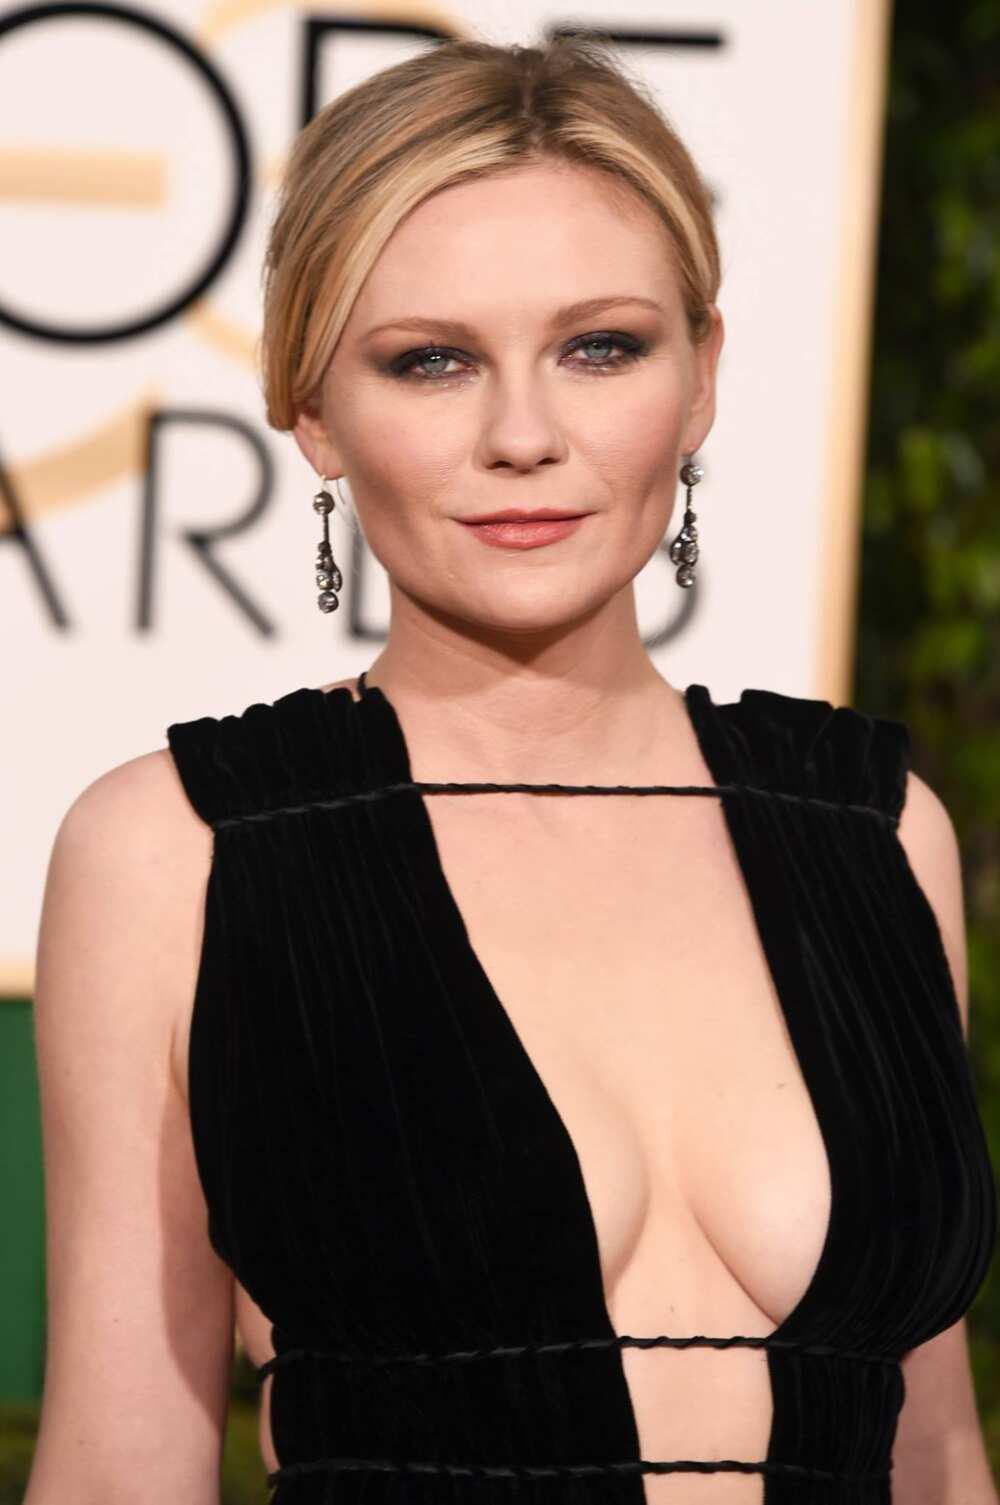 Blond actress